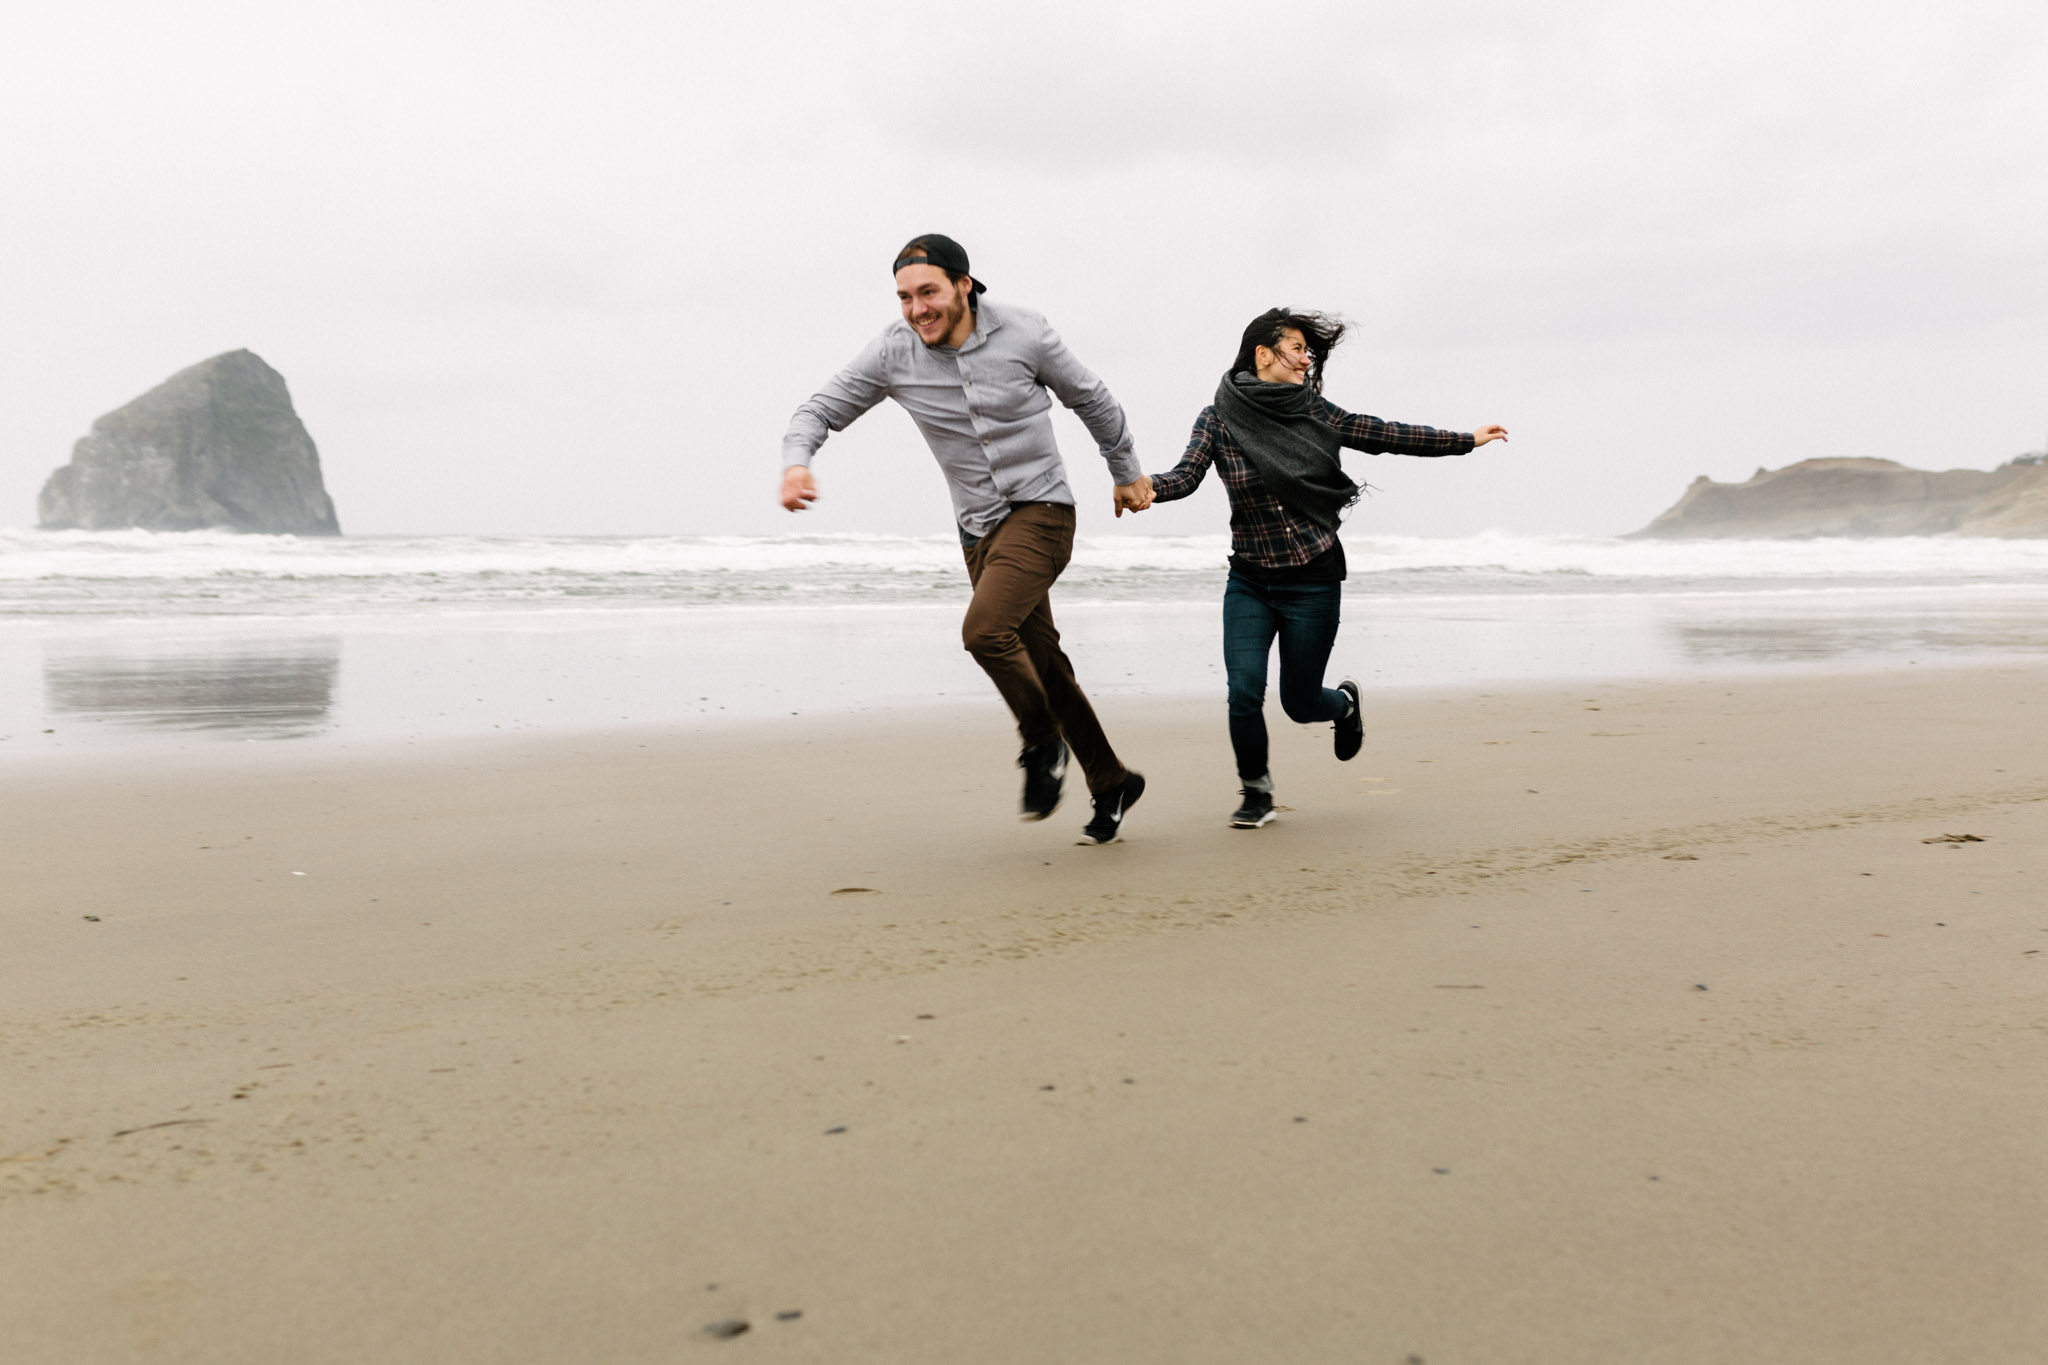 Oregon-Cape-Kiwanda-Engagement-Pia-Anna-Christian-Wedding-Photography-PNW-CJ-22.jpg